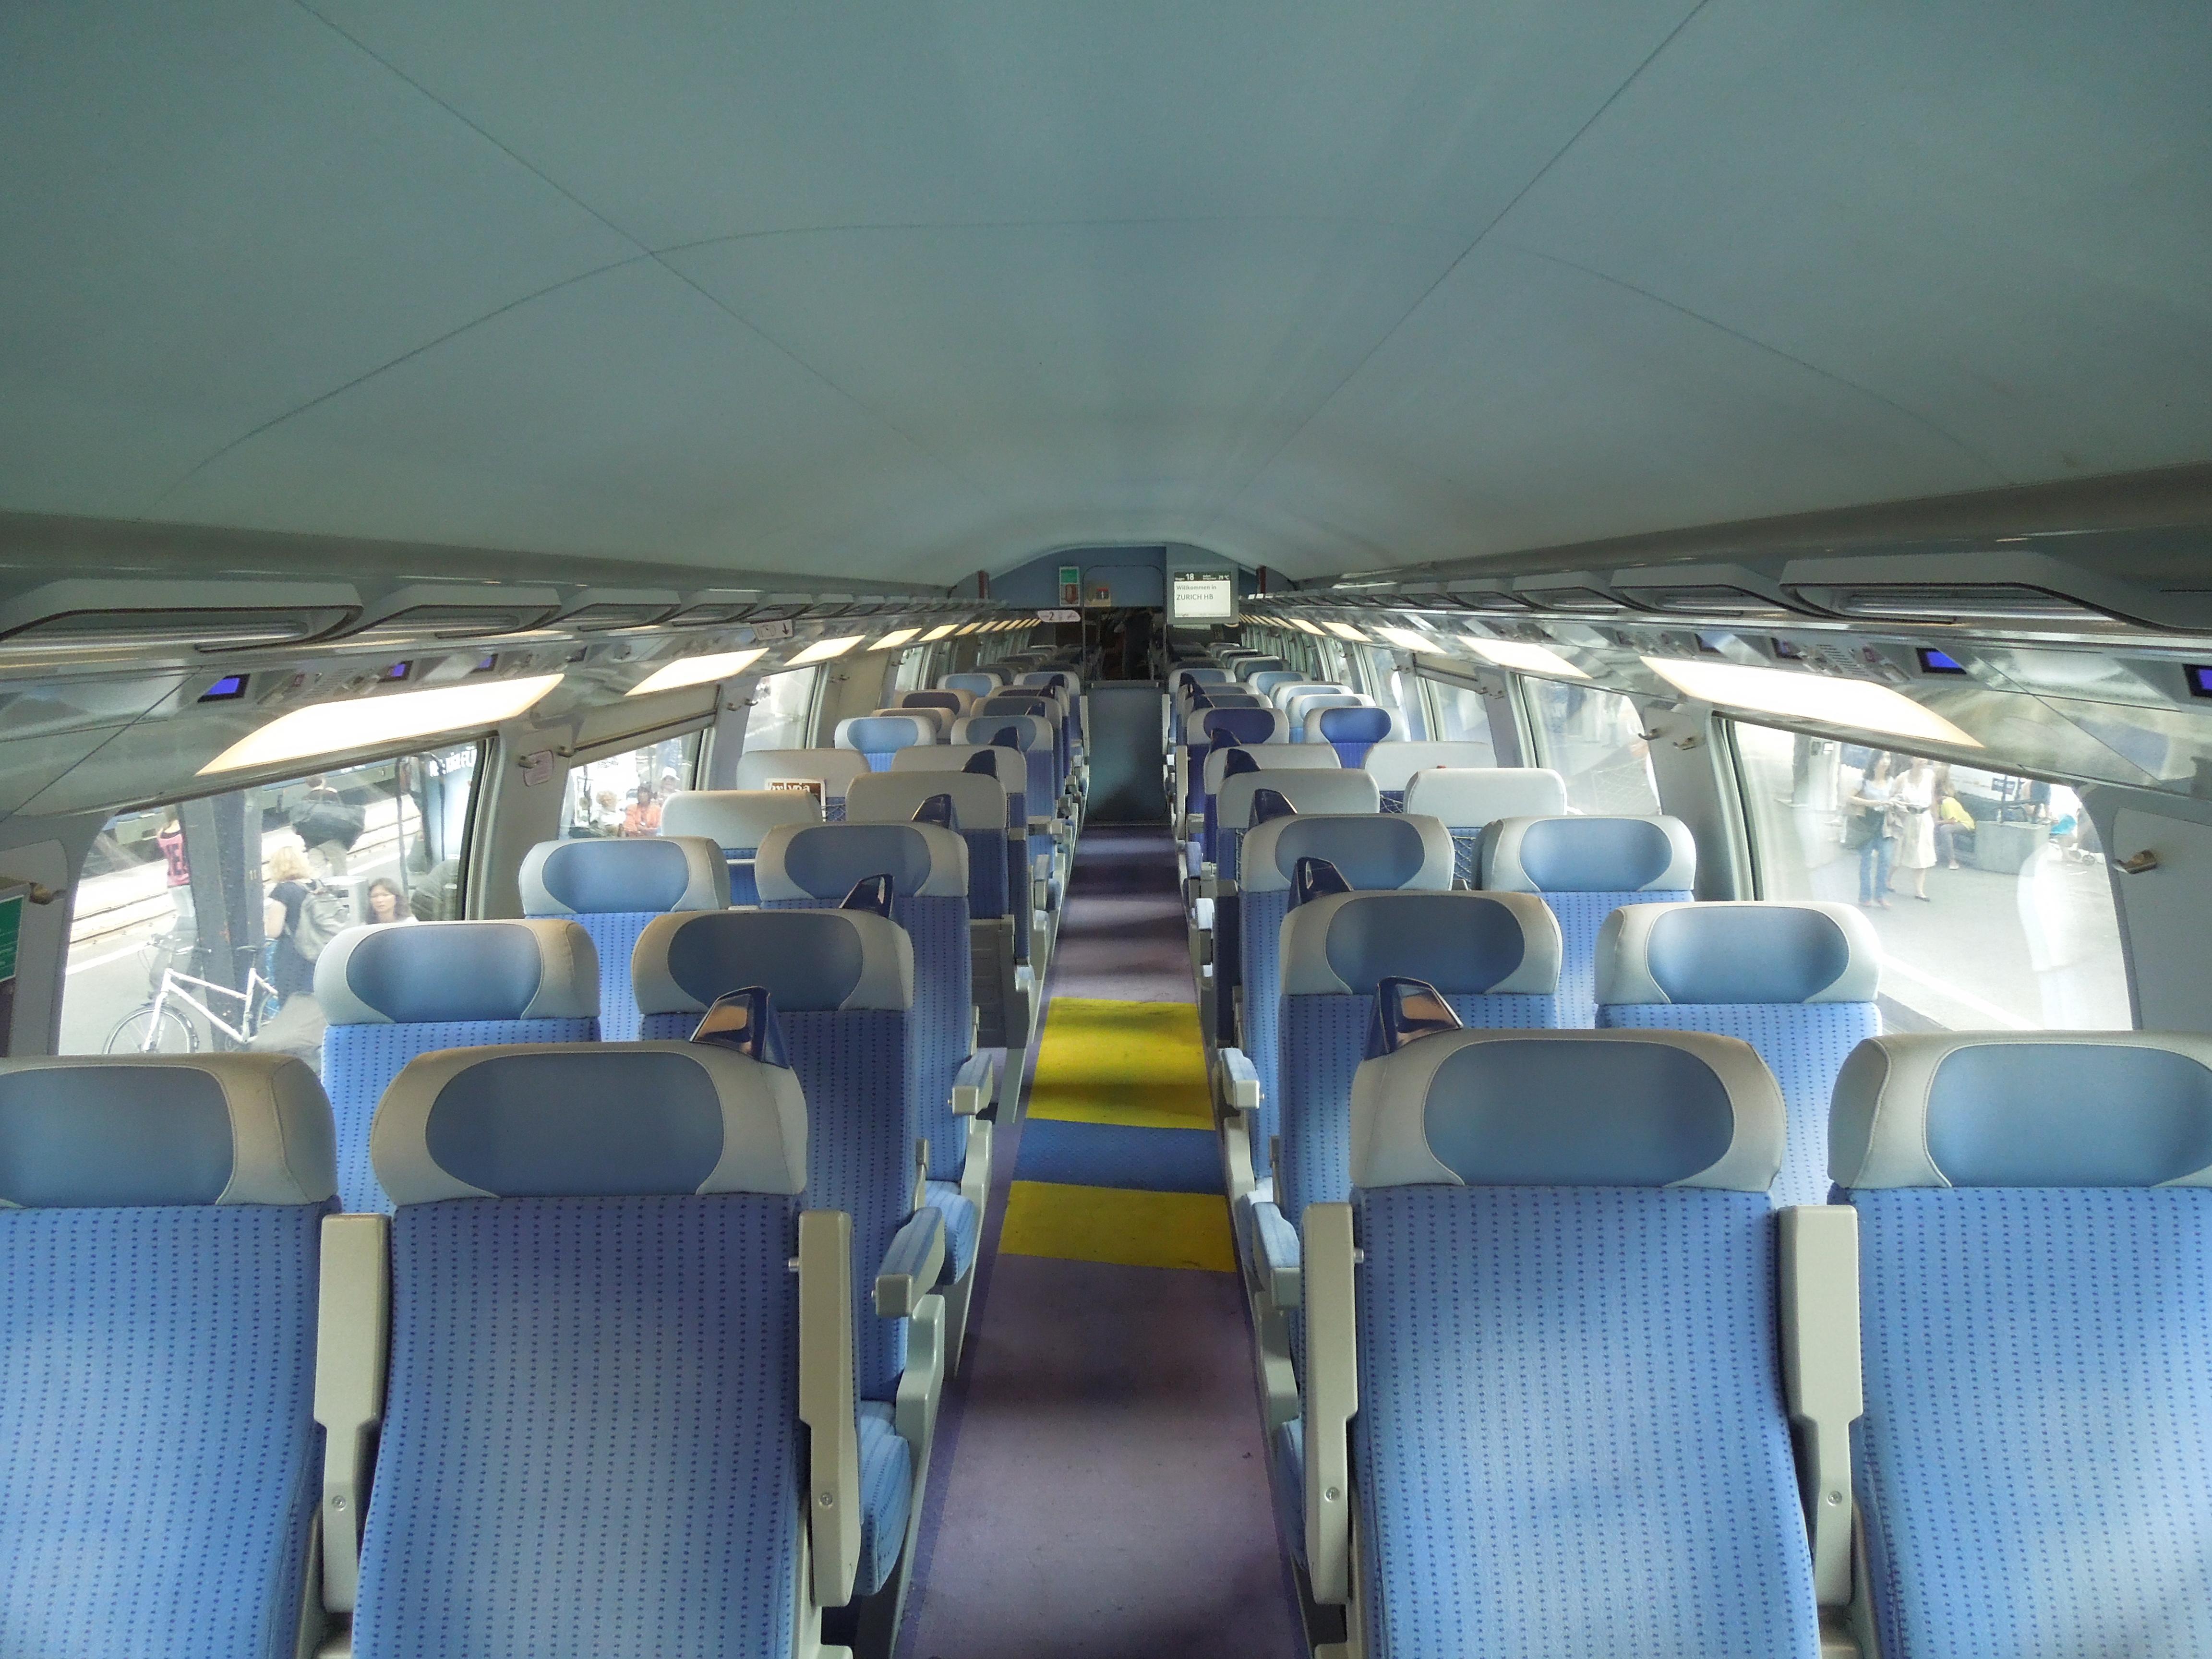 File:TGV 2N2 interior.jpg - Wikimedia Commons